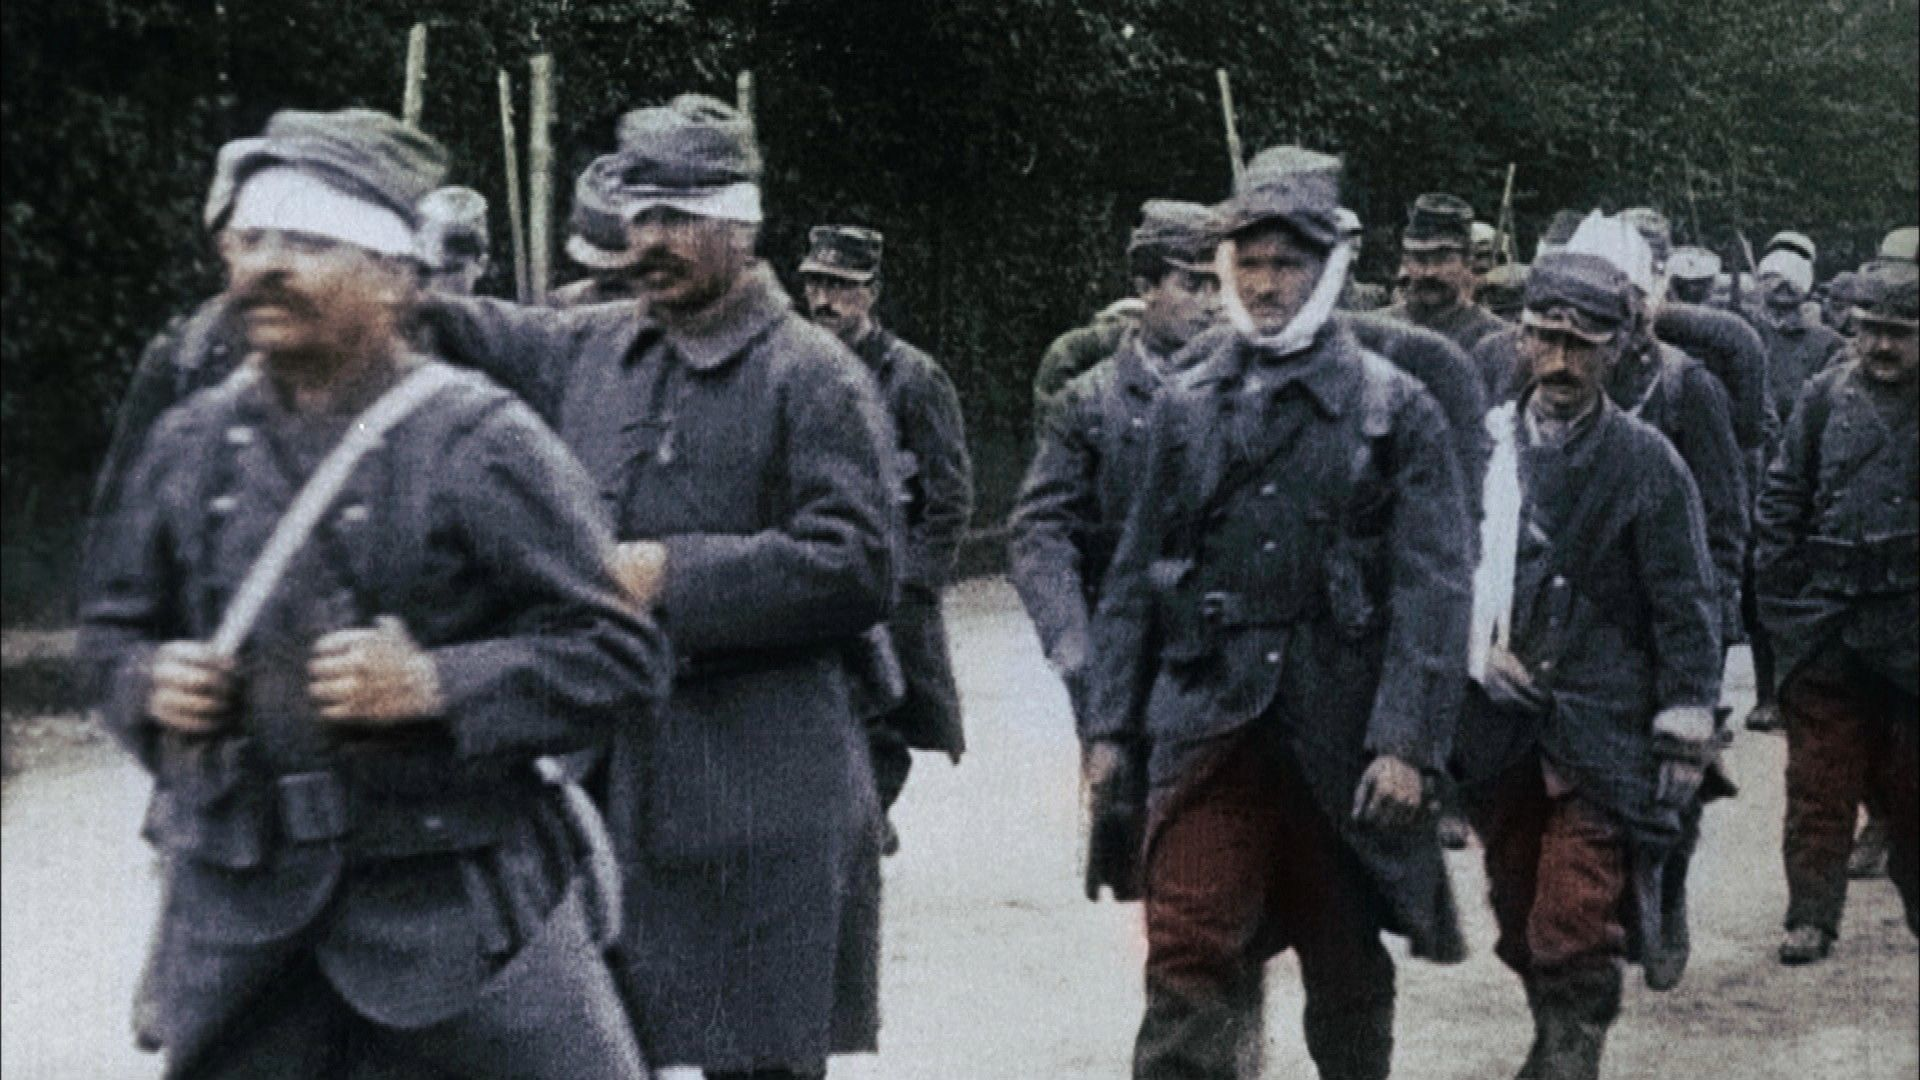 apocalipsis la primera guerra mundial latino dating